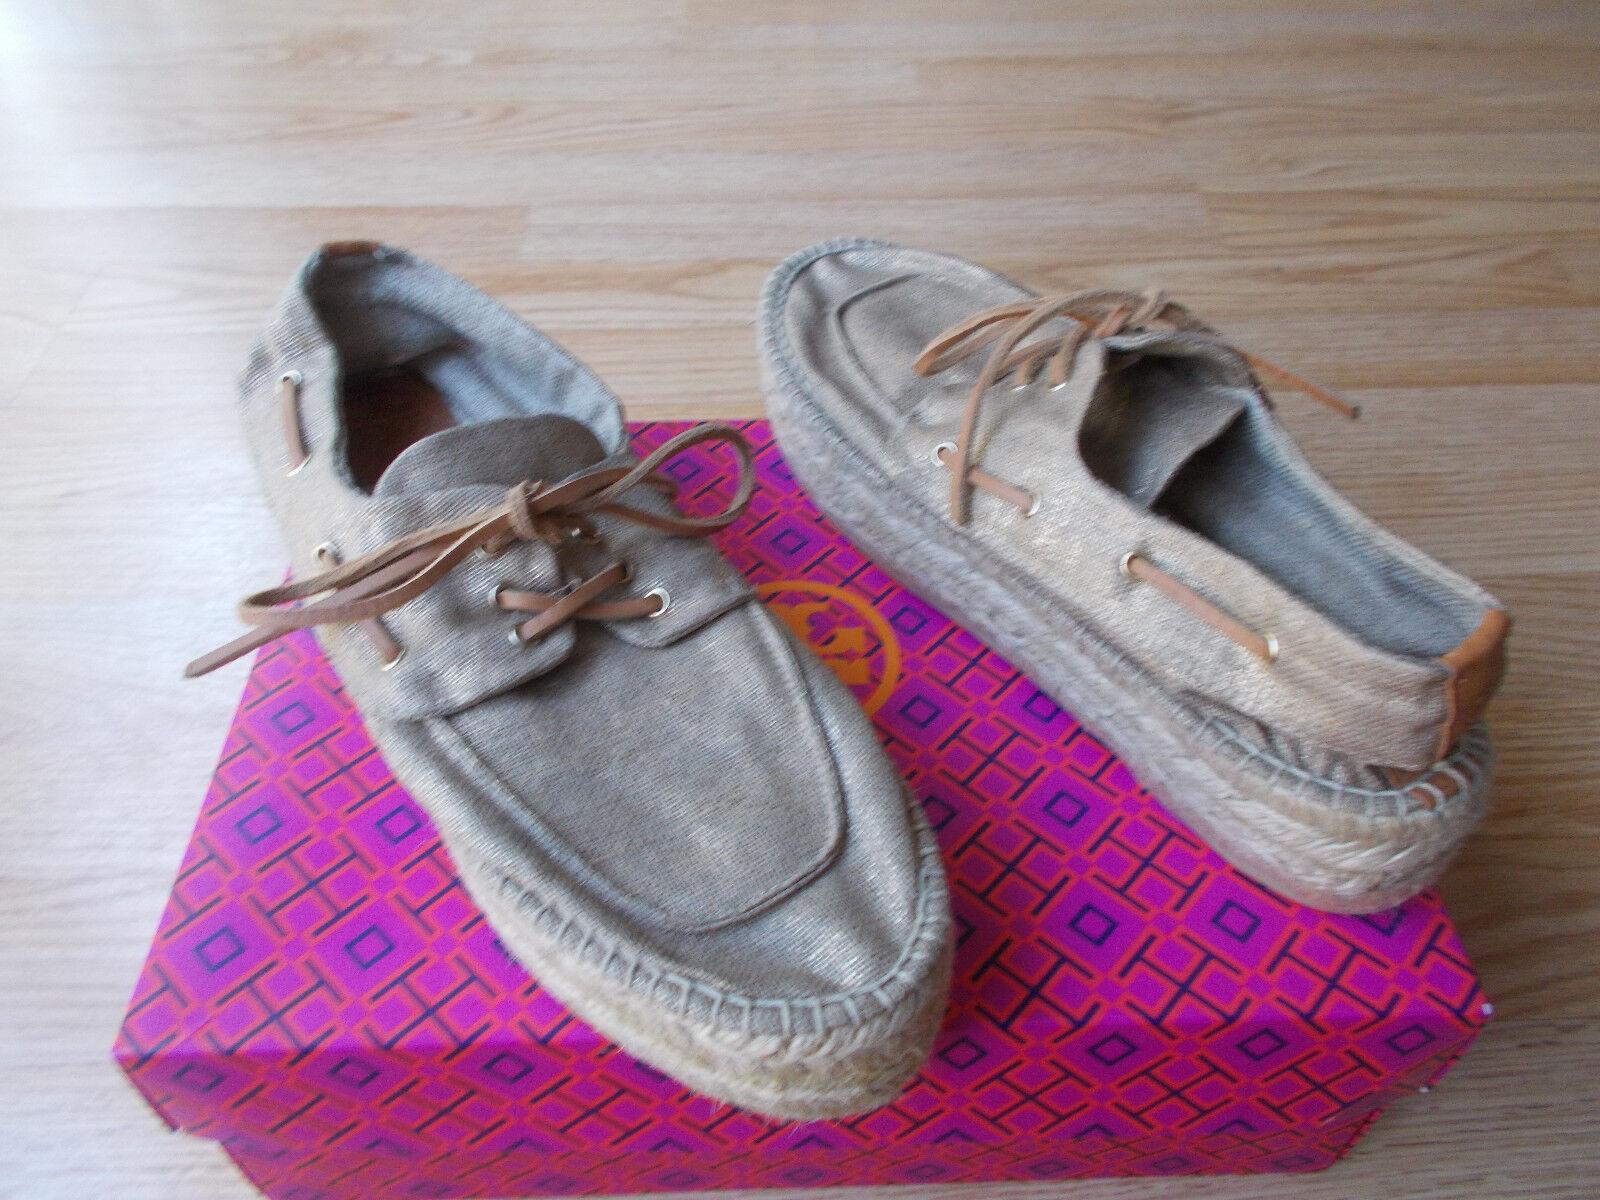 Tory Burch Blanton Boat shoes Platform Espadrille Khaki Metallic 11 US 10.5 NEW